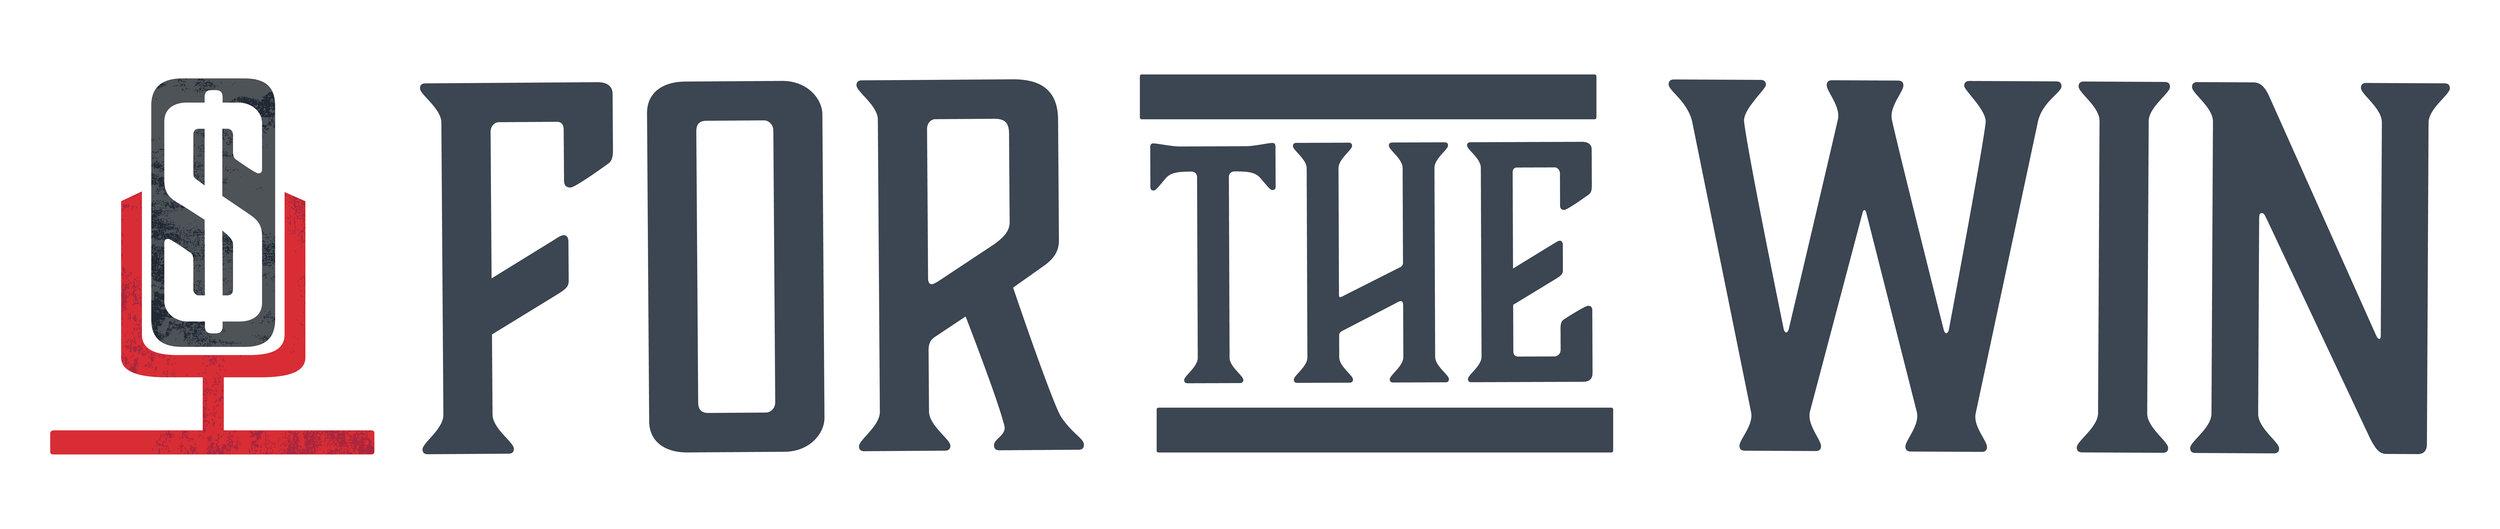 ForTheWin_Assets&Logo copy-10.jpg